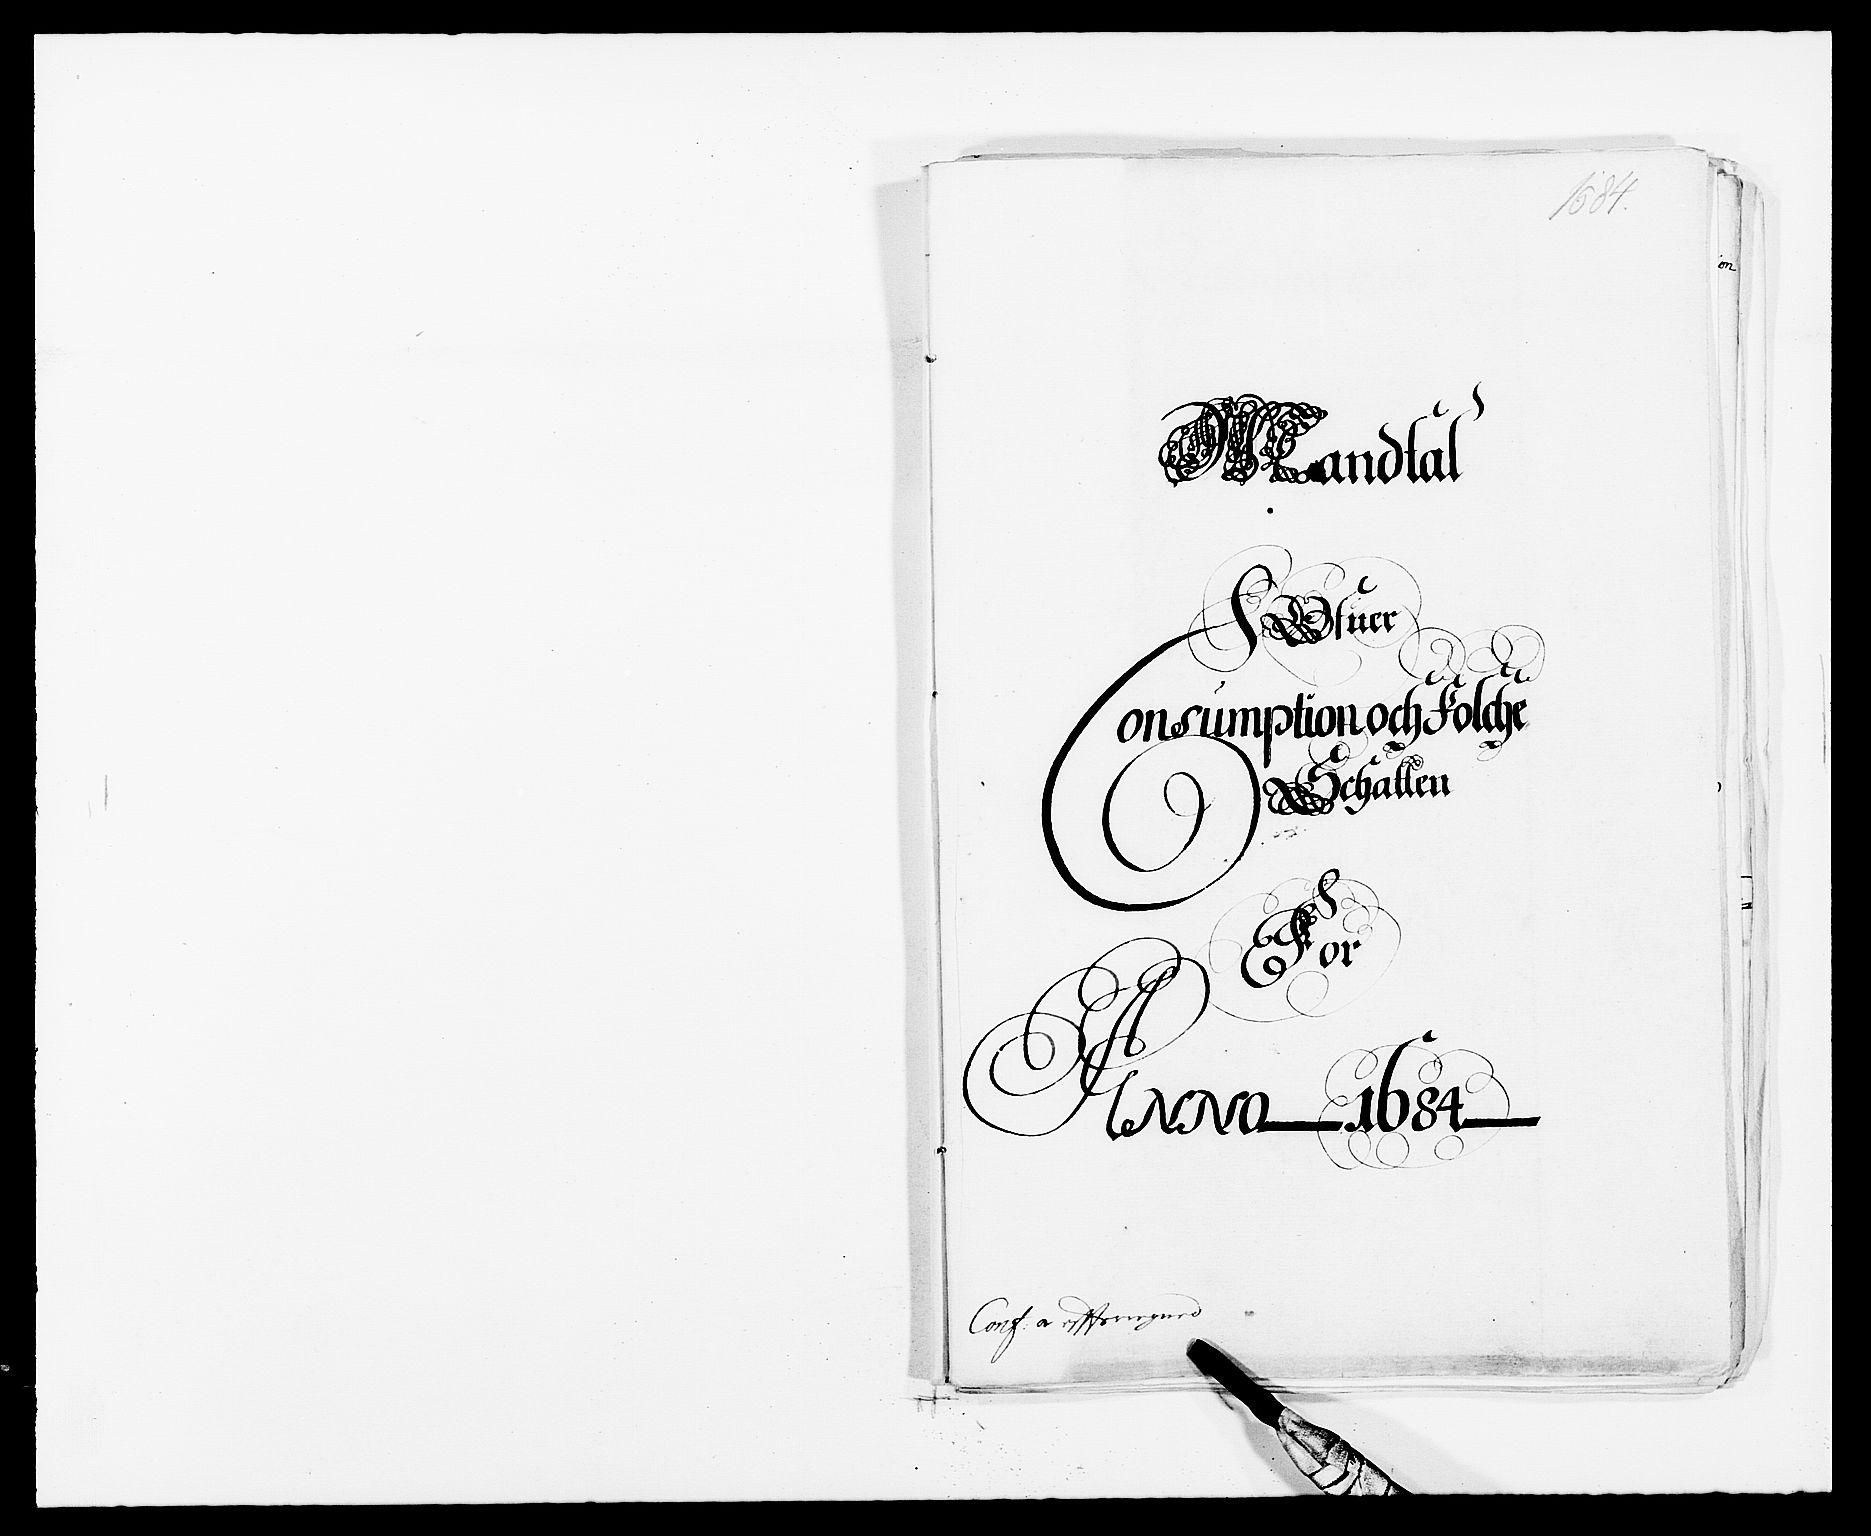 RA, Rentekammeret inntil 1814, Reviderte regnskaper, Fogderegnskap, R32/L1855: Fogderegnskap Jarlsberg grevskap, 1684, s. 120